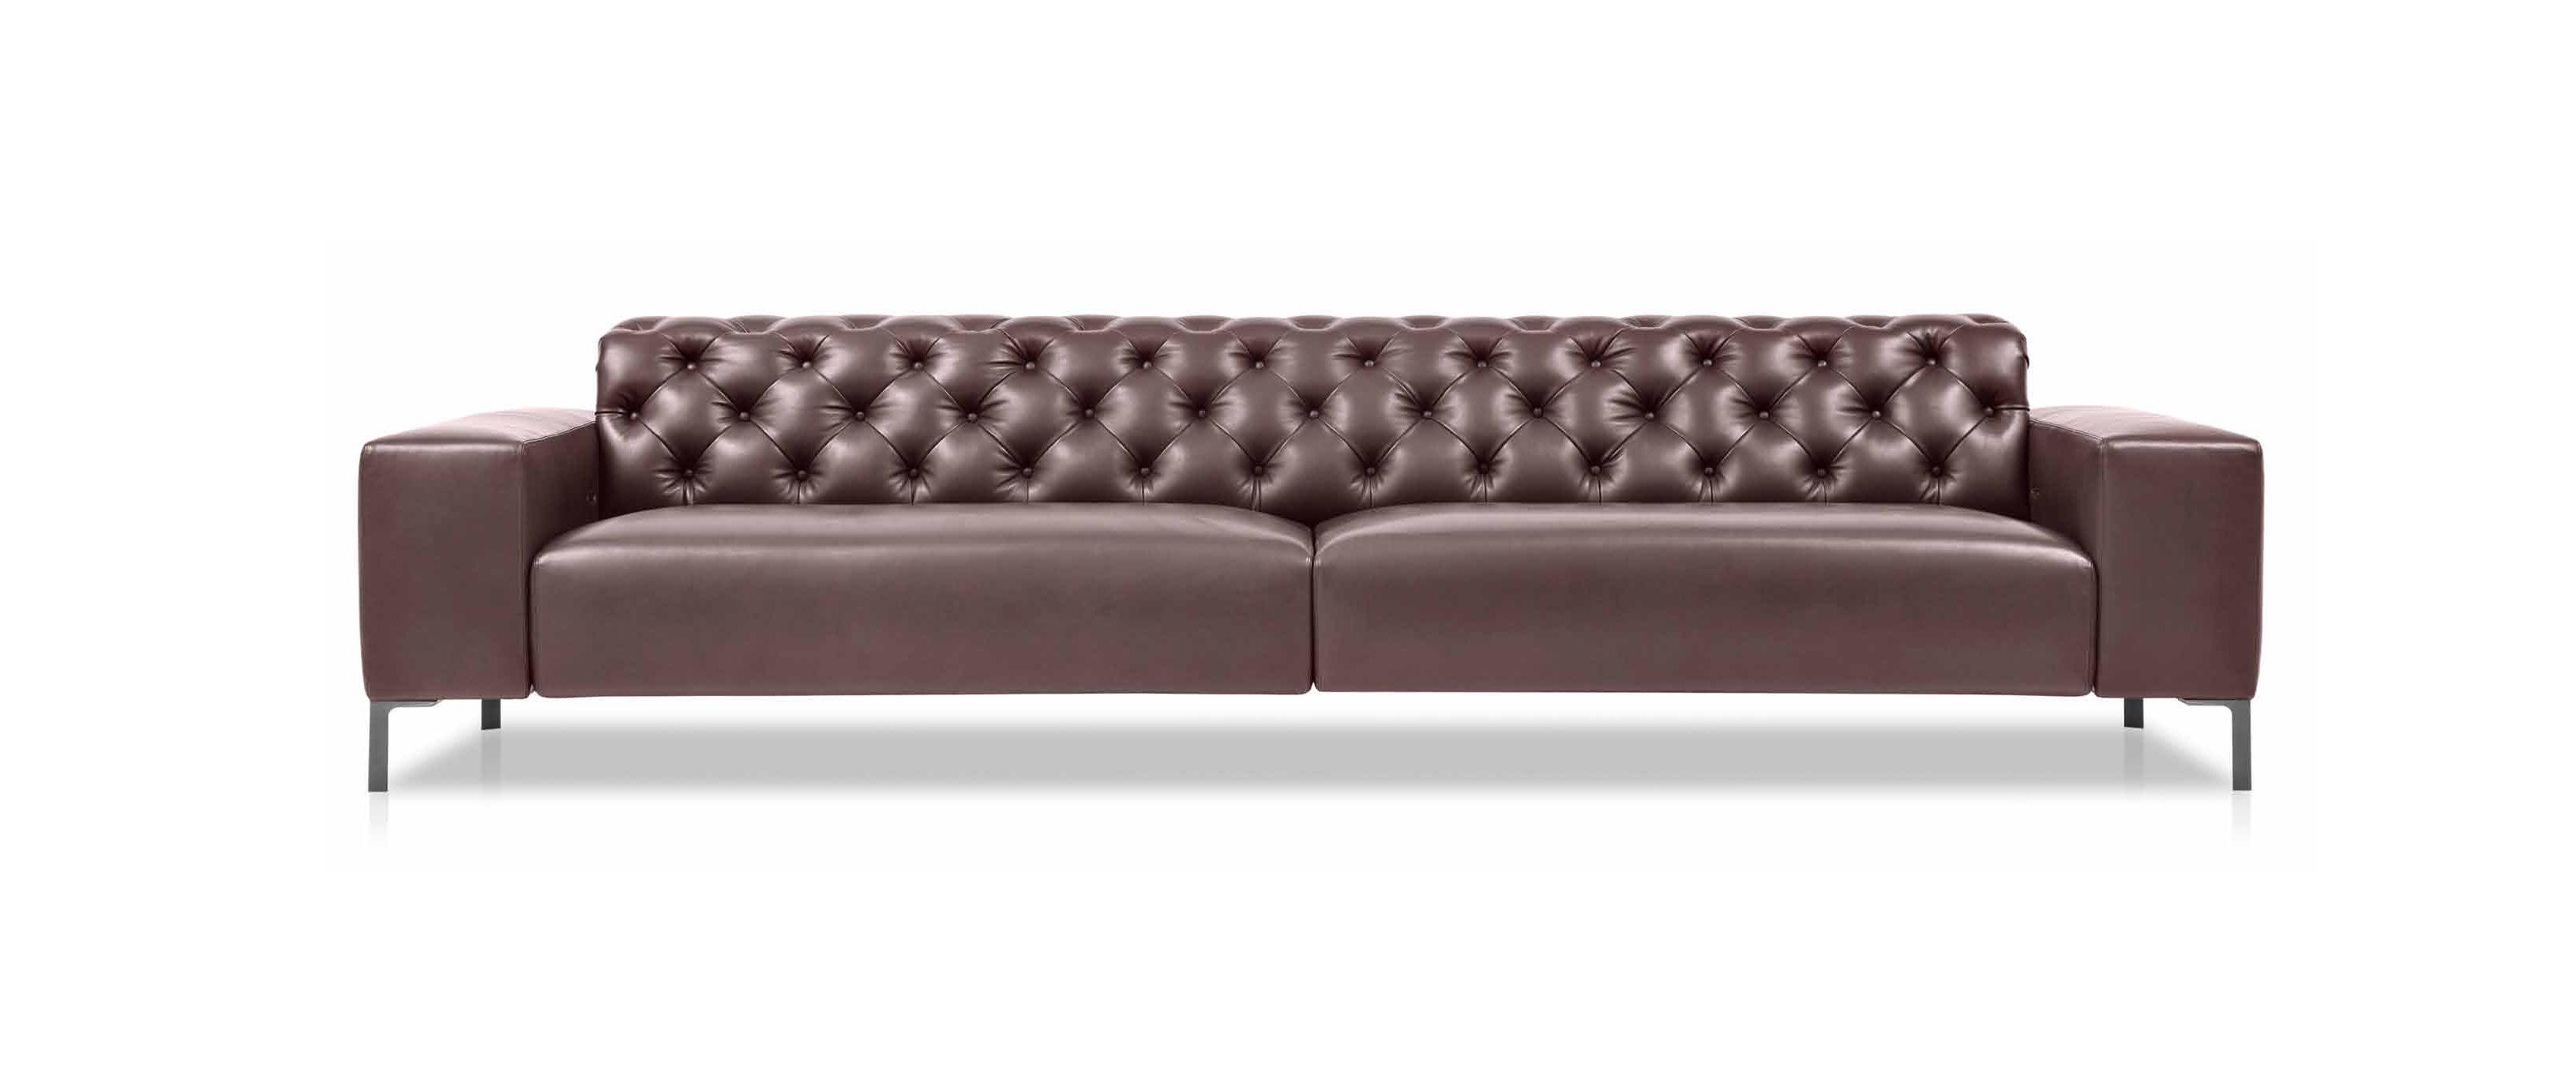 High Quality Boston Kanapé | Boston Sofa Gyártó | Manufacturer: Pianca Http://www.